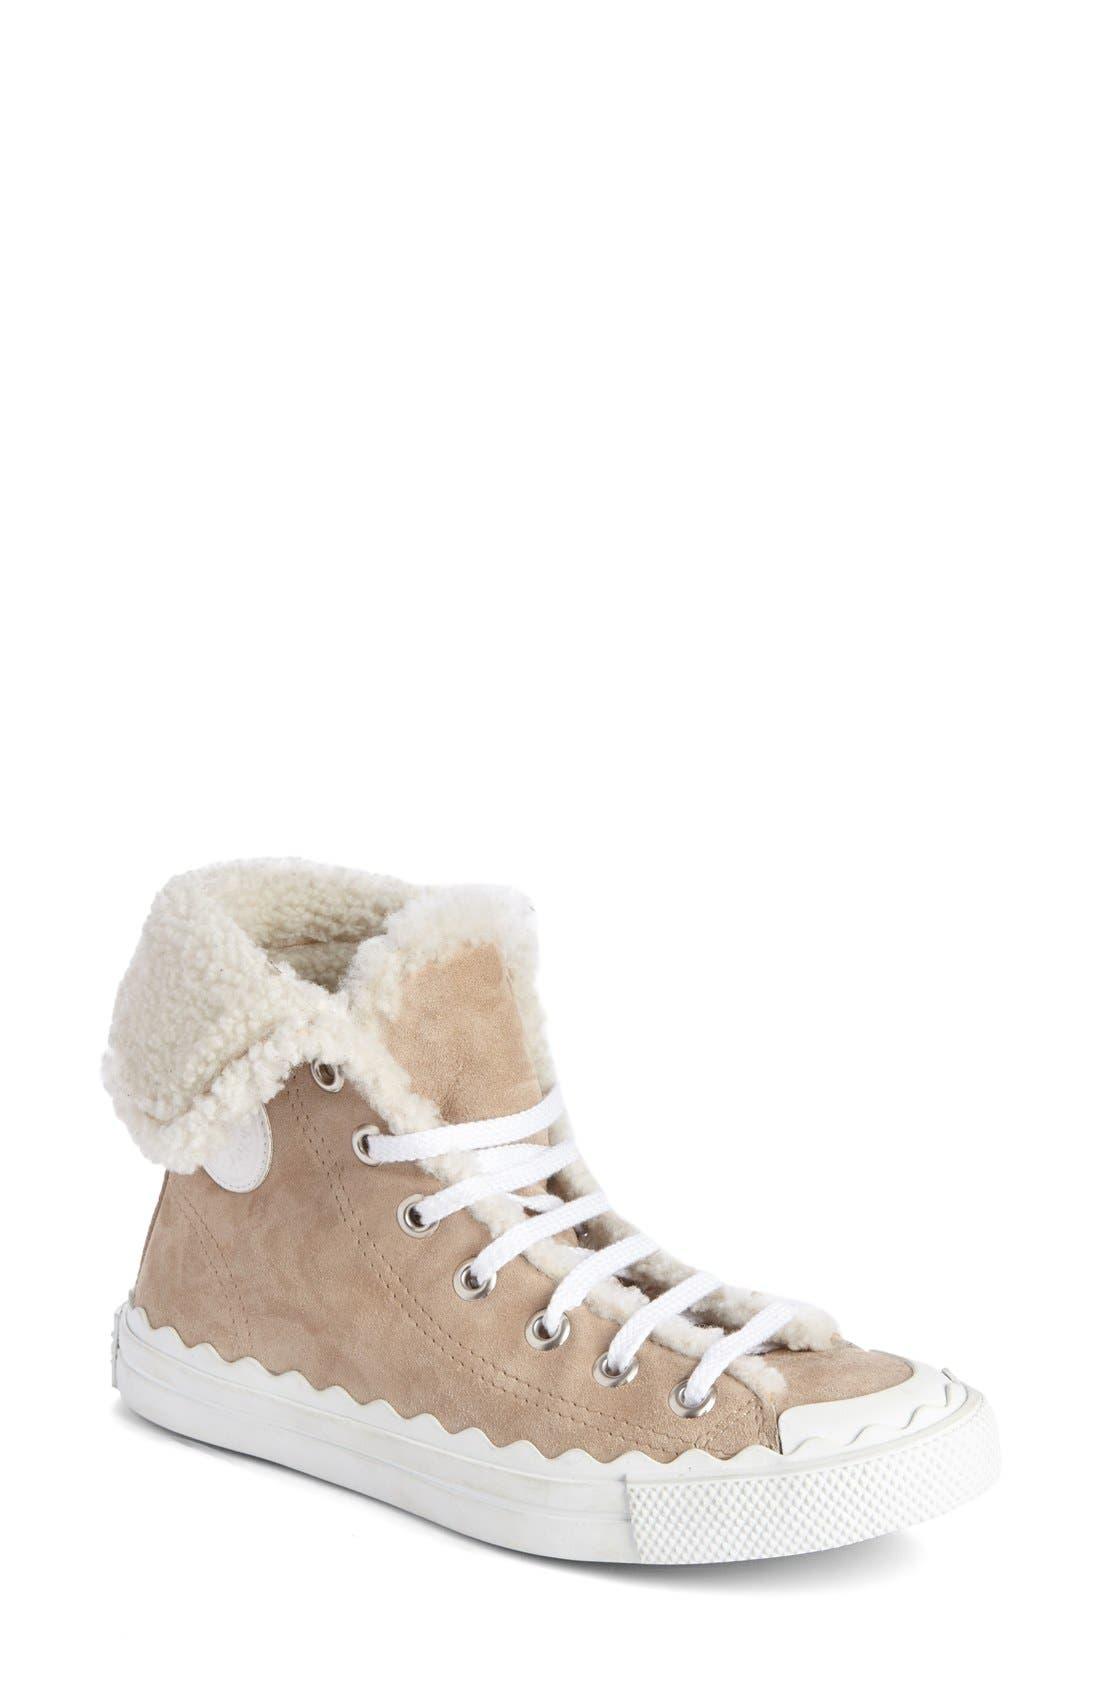 CHLOÉ 'Kyle' Genuine Shearling Sneaker